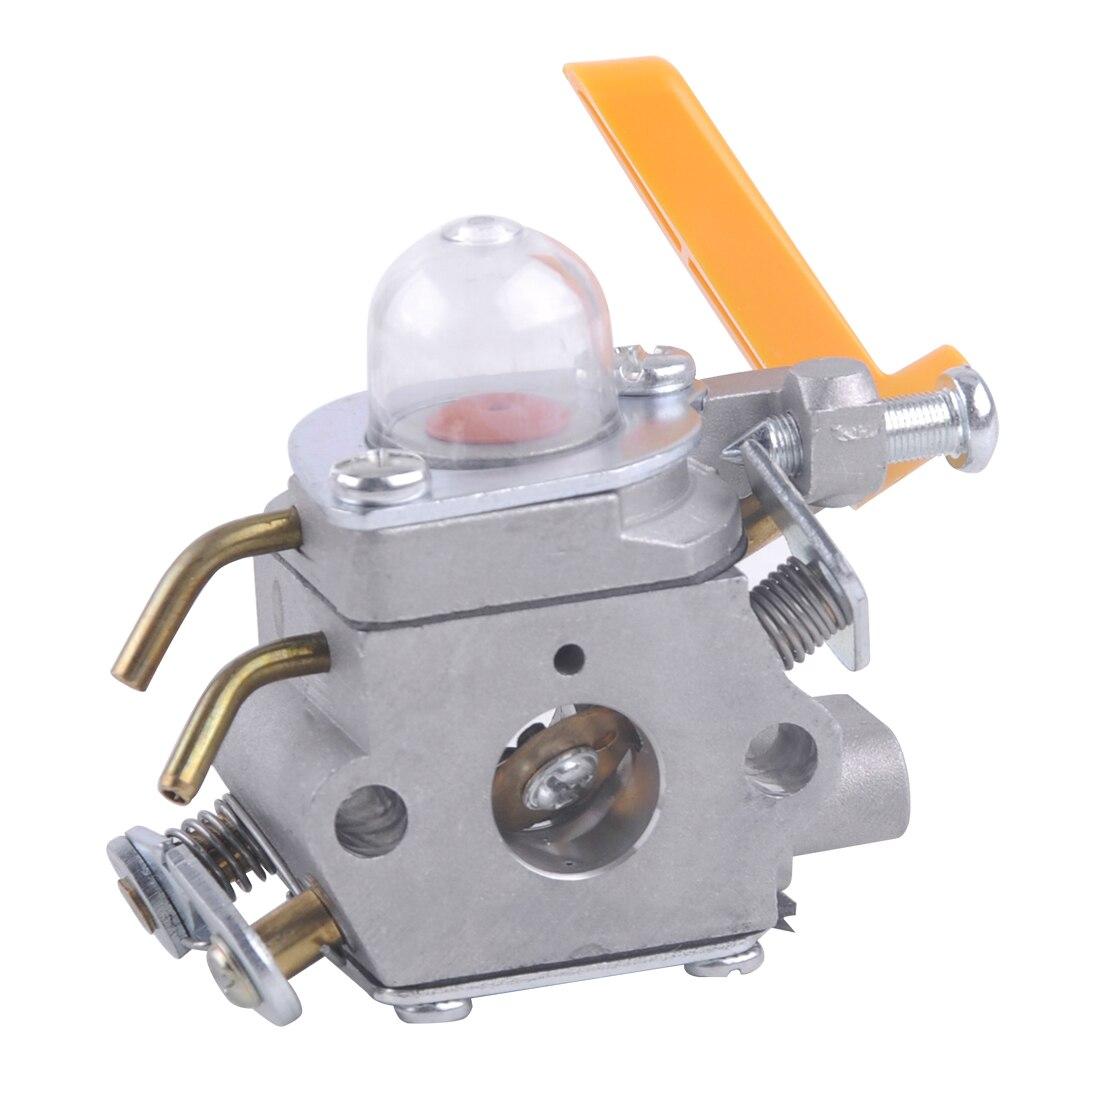 LETAOSK Carburetor Carb Fit For Homelite Ryobi Trimmer Replace C1U-H60 308054013 308054003